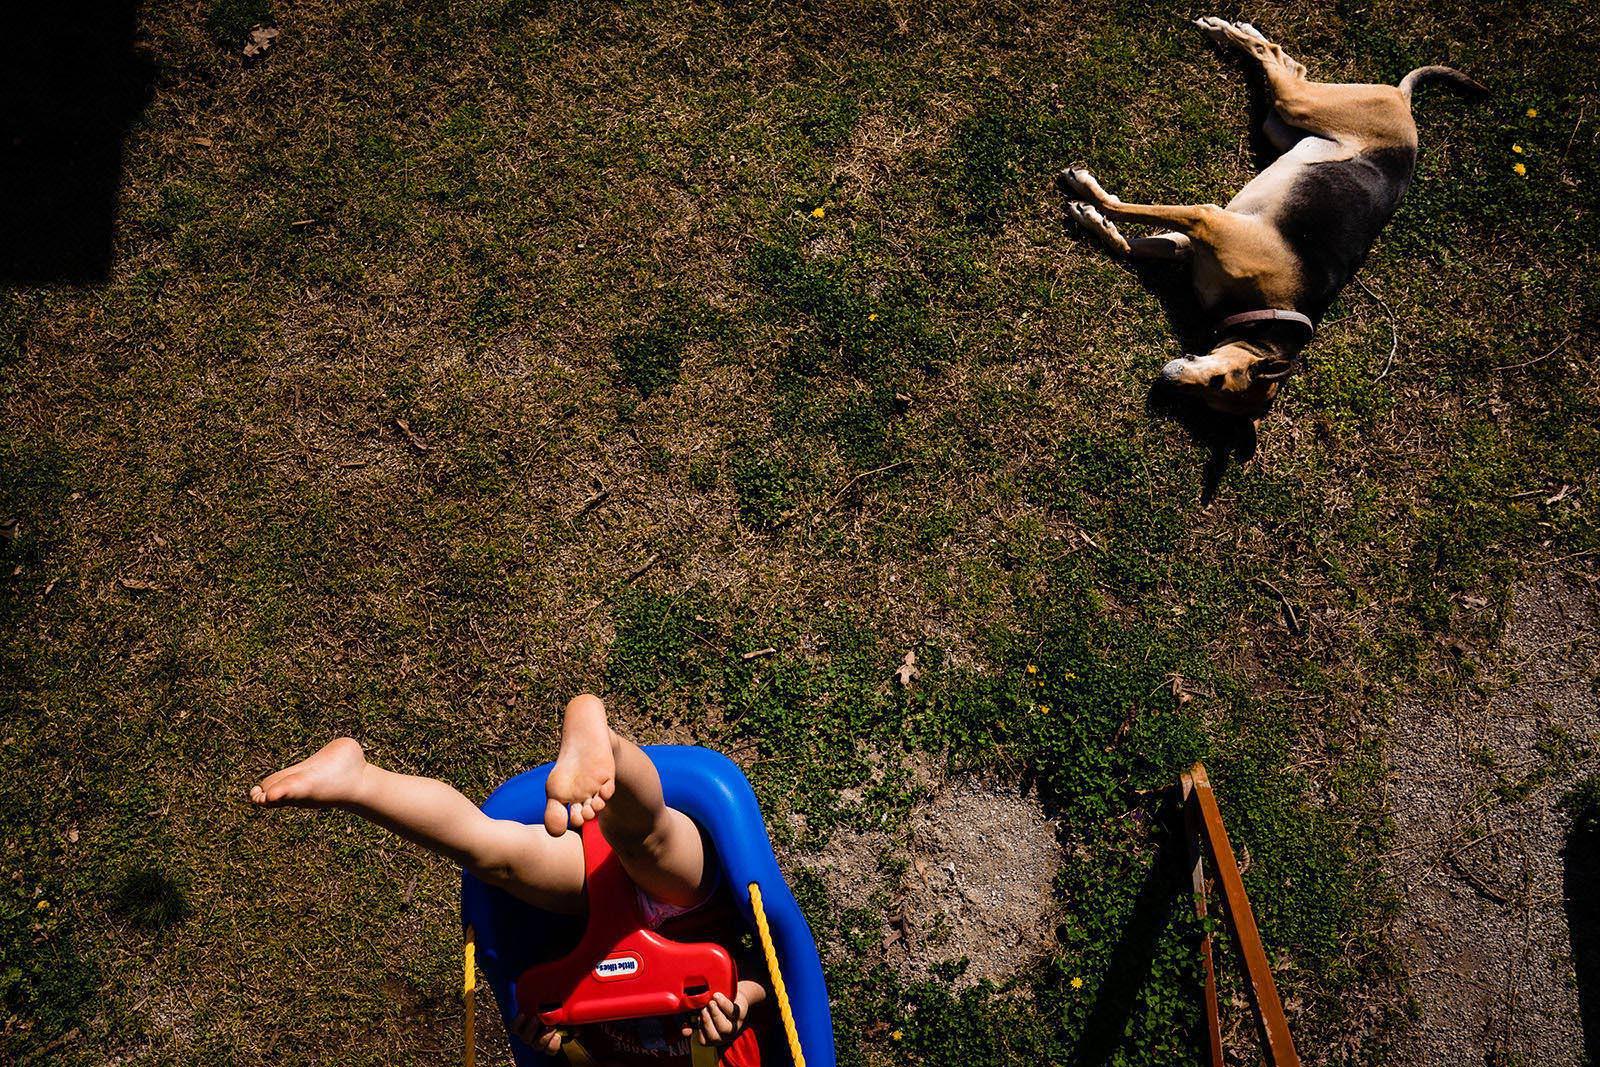 A child swings in yard with dog during Coronavirus self quarantine